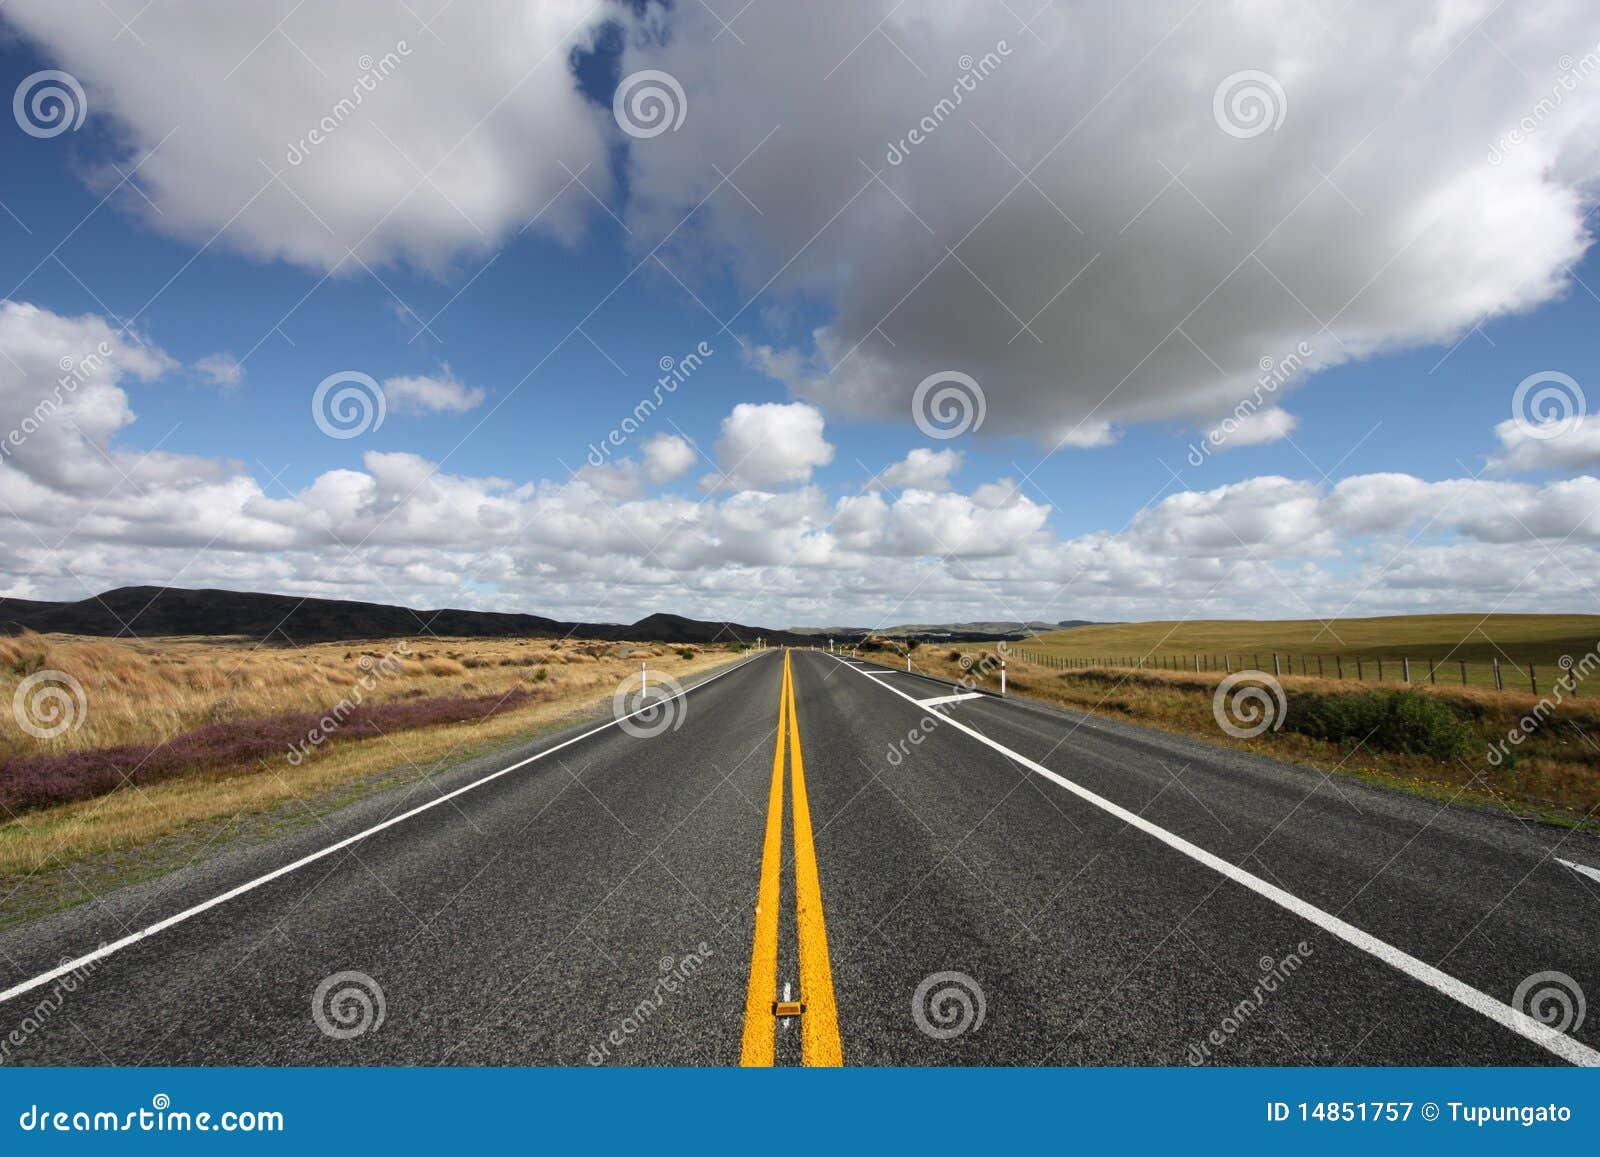 Straight scenic road